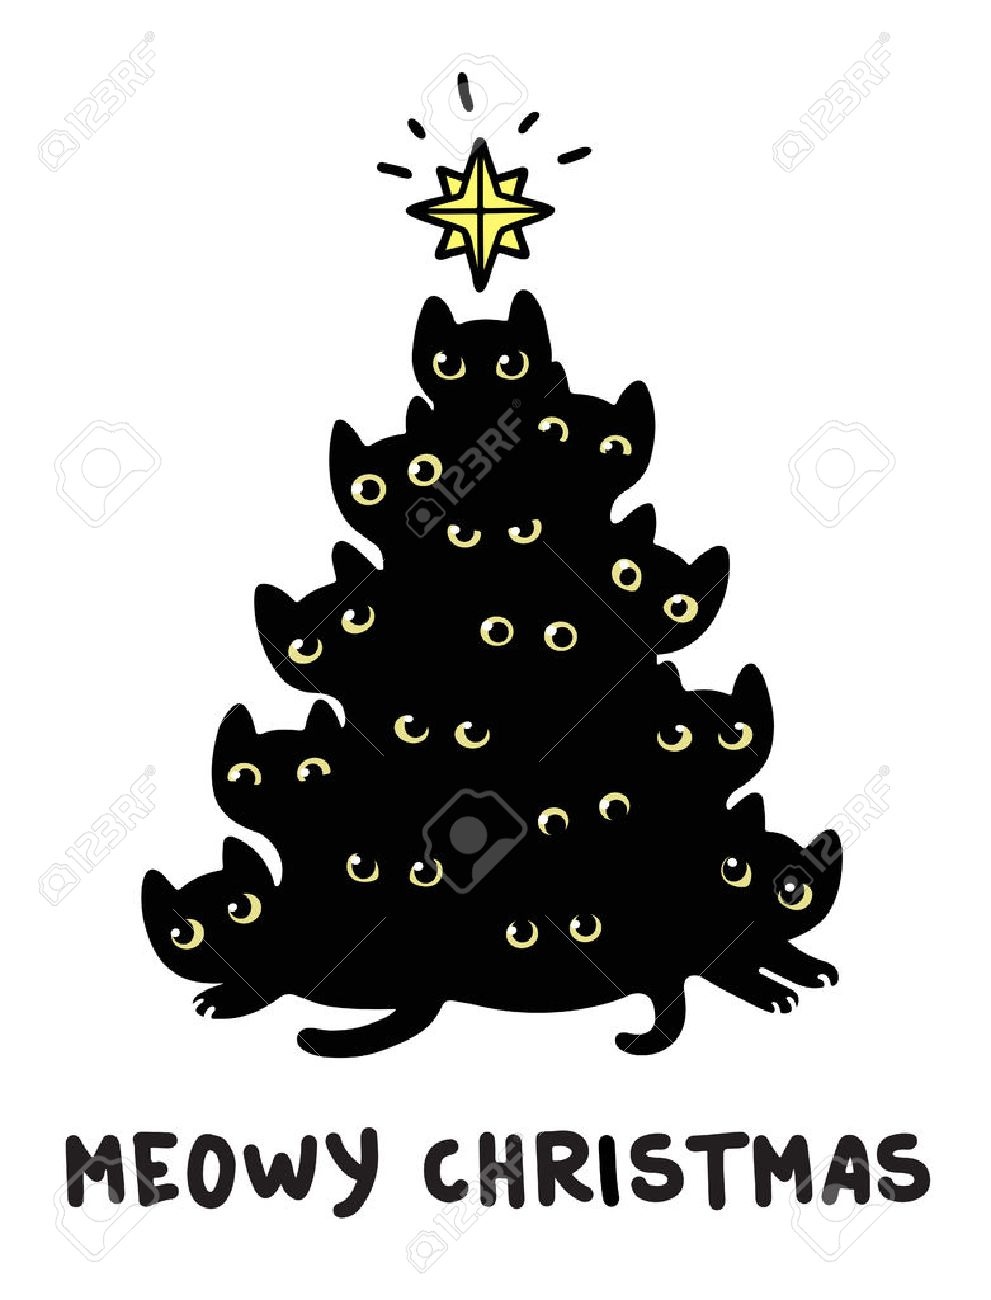 Cute Cartoon Black Cats Christmas Tree Silhouette With Text Meowy Cat Christmas Tree Christmas Drawing Christmas Tree Silhouette